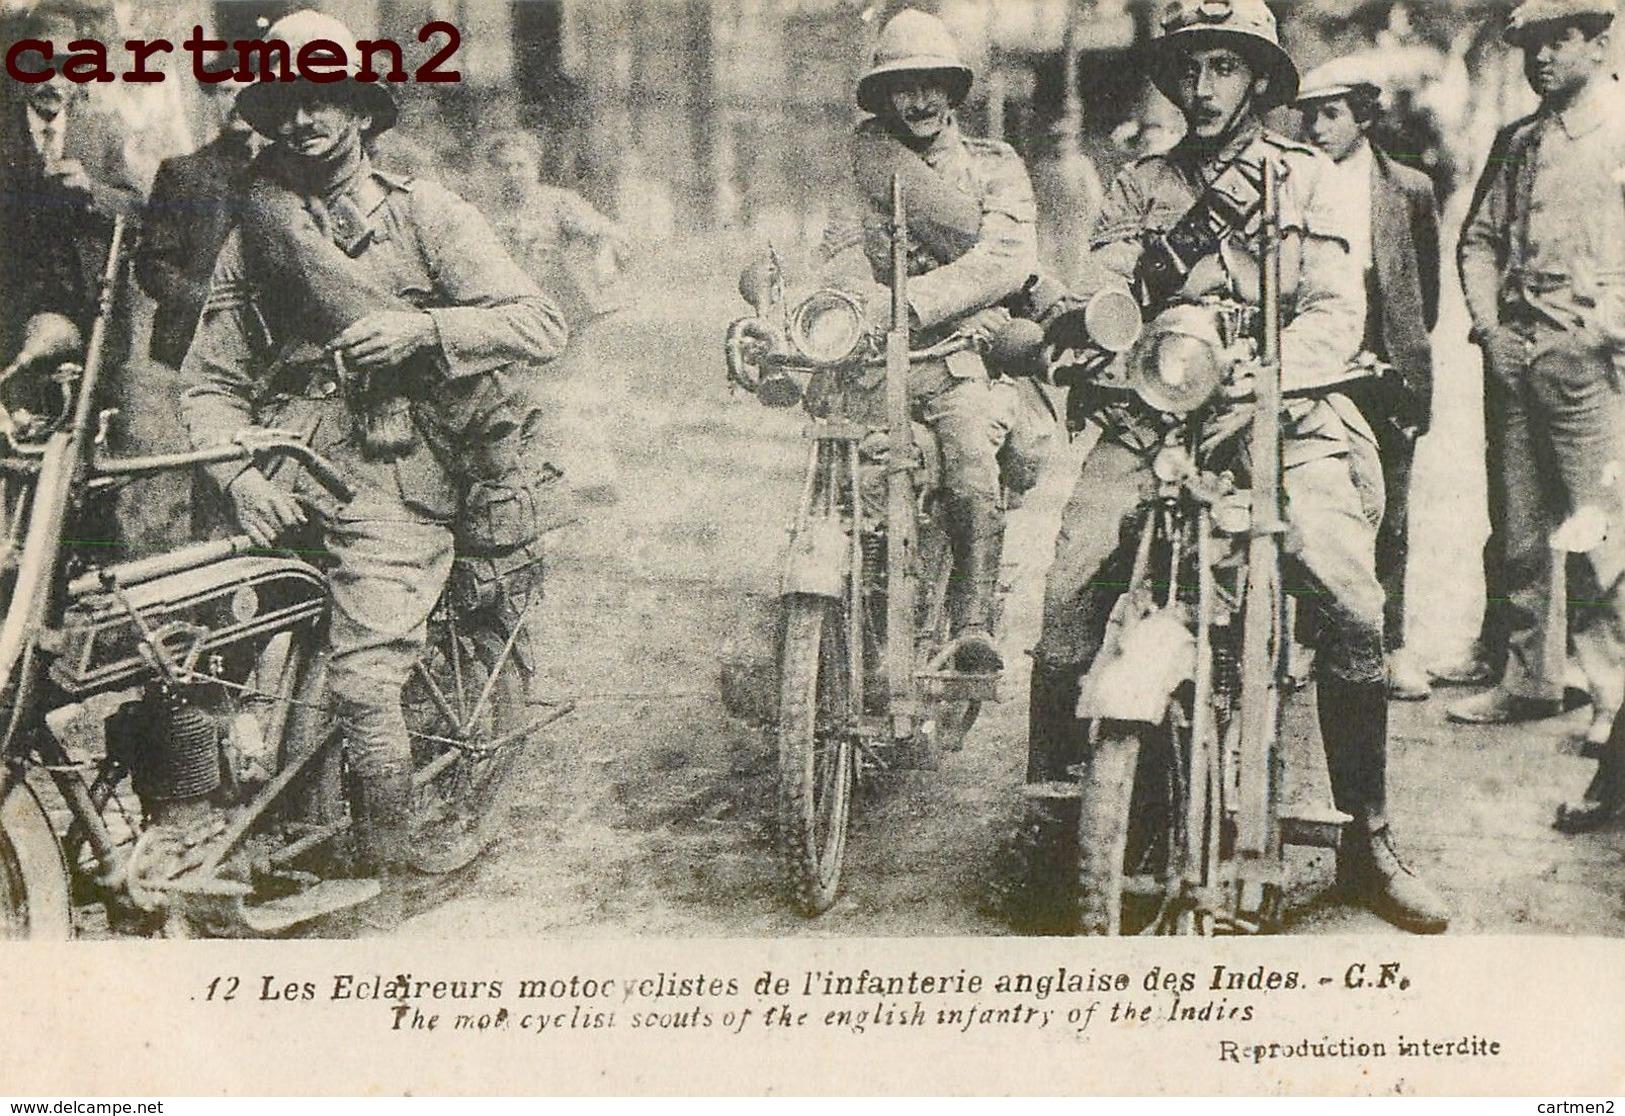 ECLAIREURS MOTOCYCLISTES IINFANTERIE ANGLAISE DES INDES INFANTERY INDIES INDE INDIA MOTO GUERRE - Motos